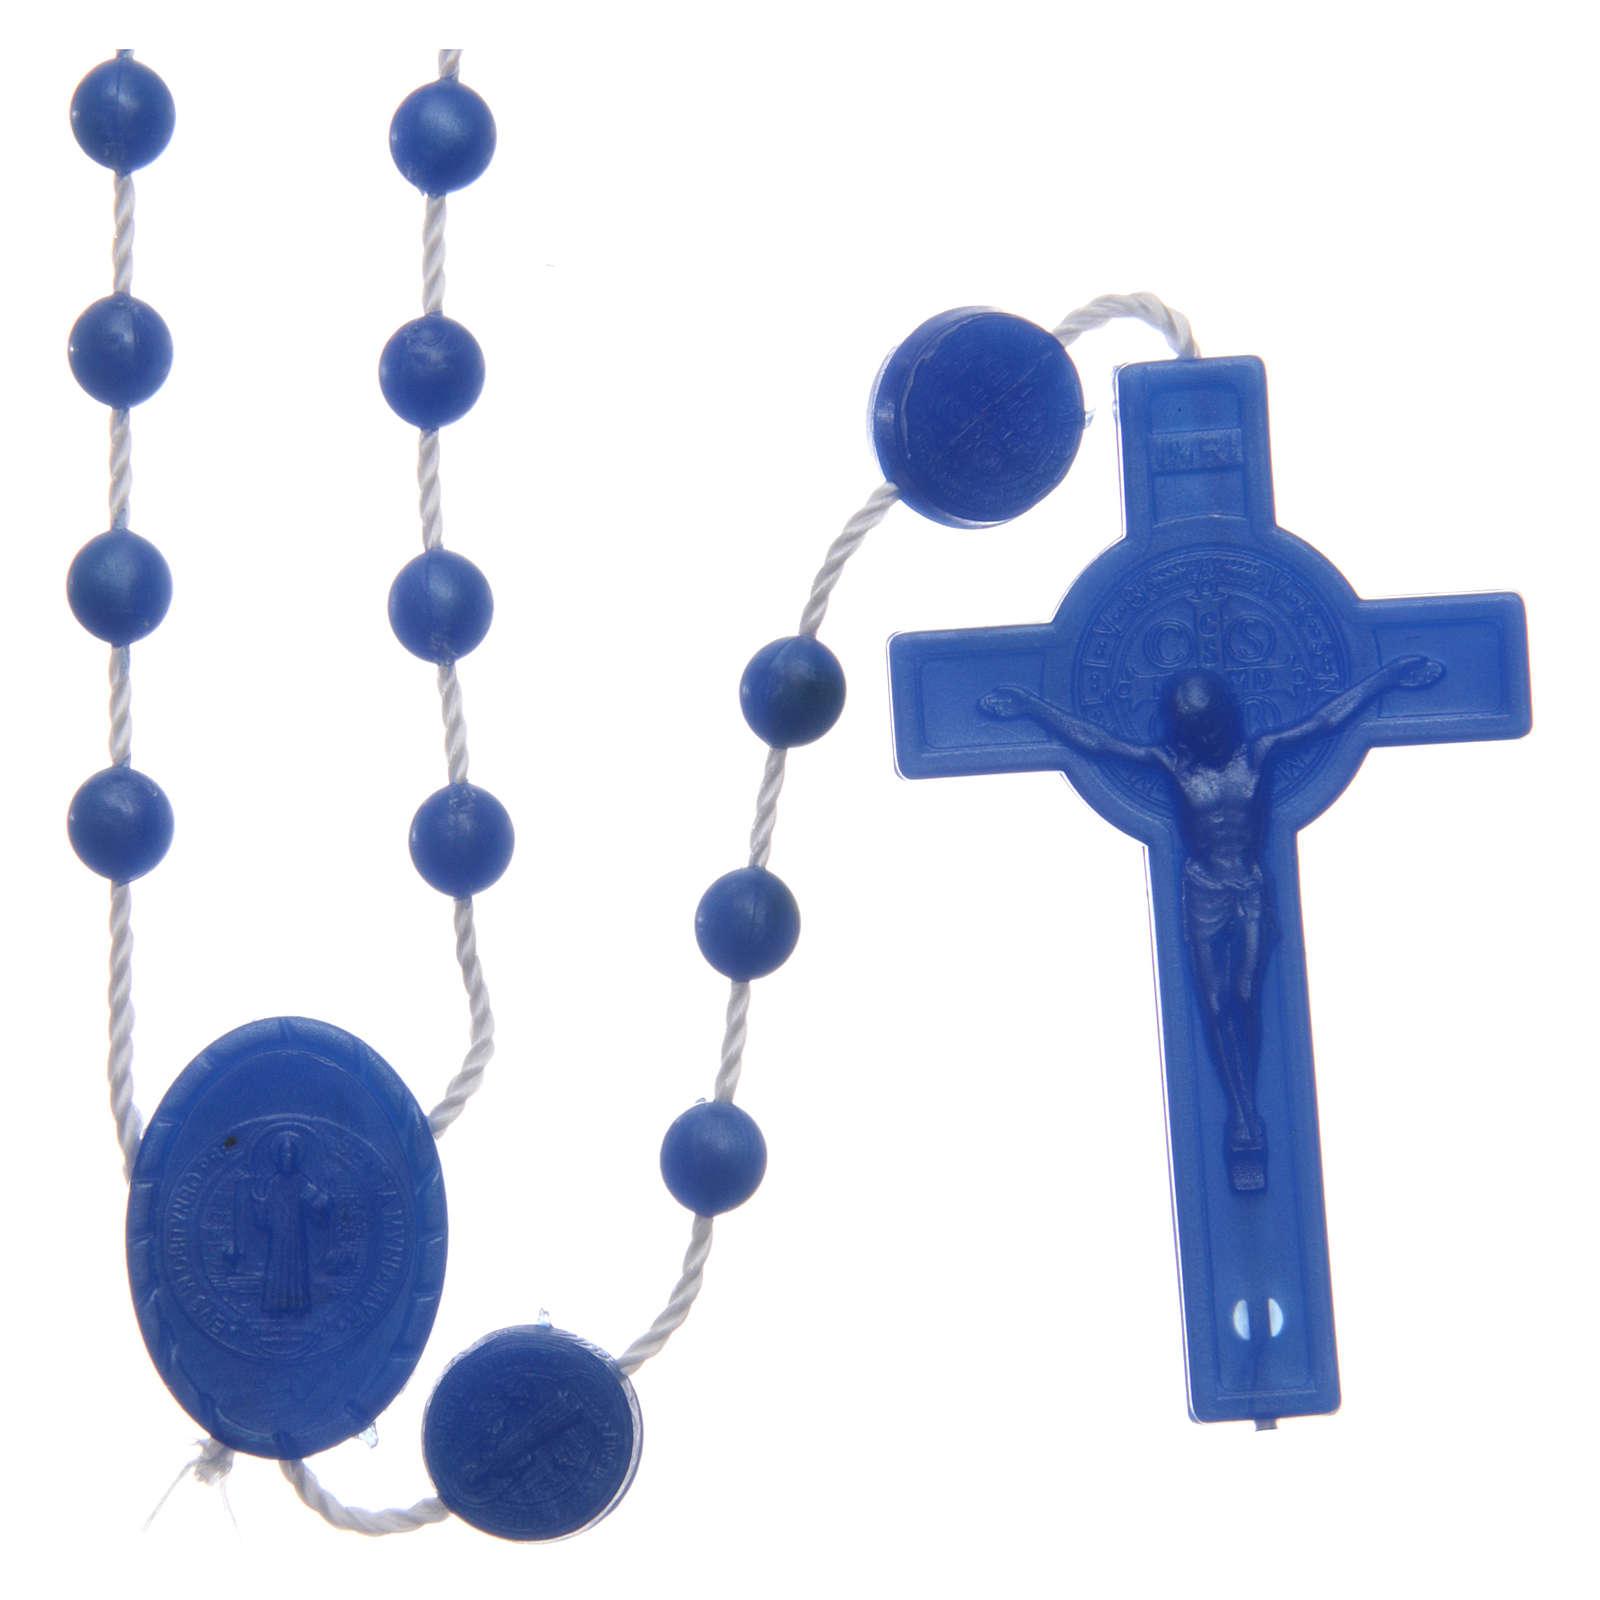 Chapelet nylon bleu Saint Benoît 6 mm 4